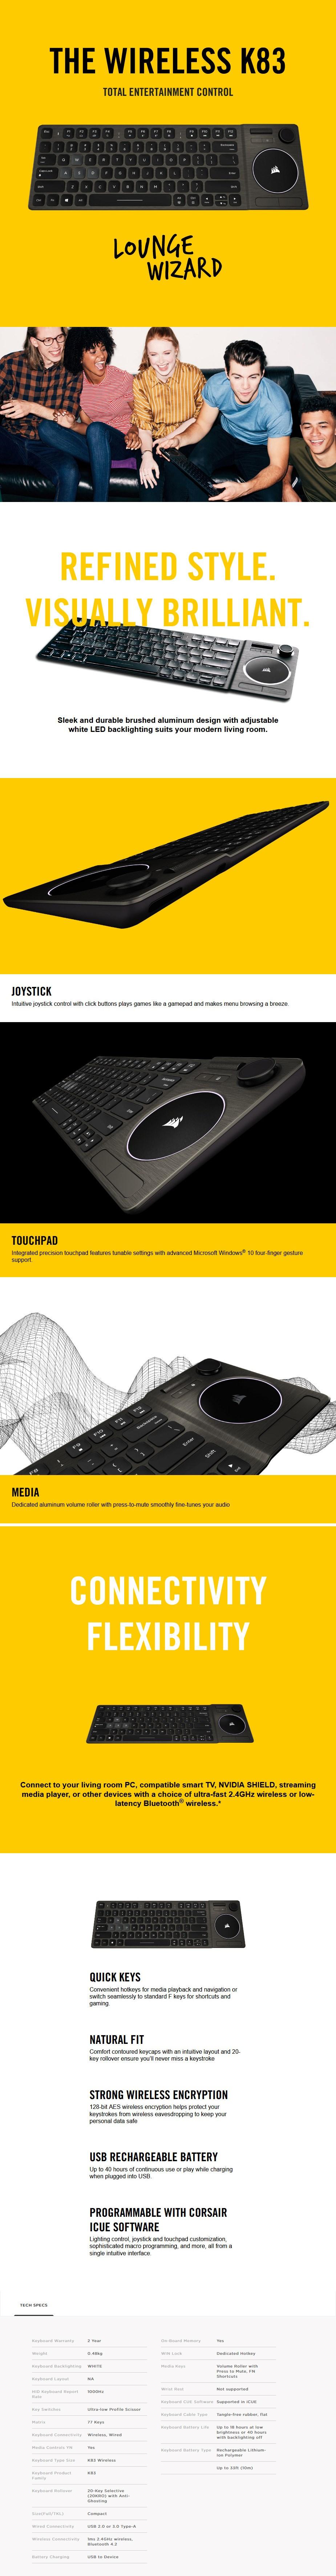 corsair-k83-compact-wireless-entertainment-keyboard-ac33617-4.jpg